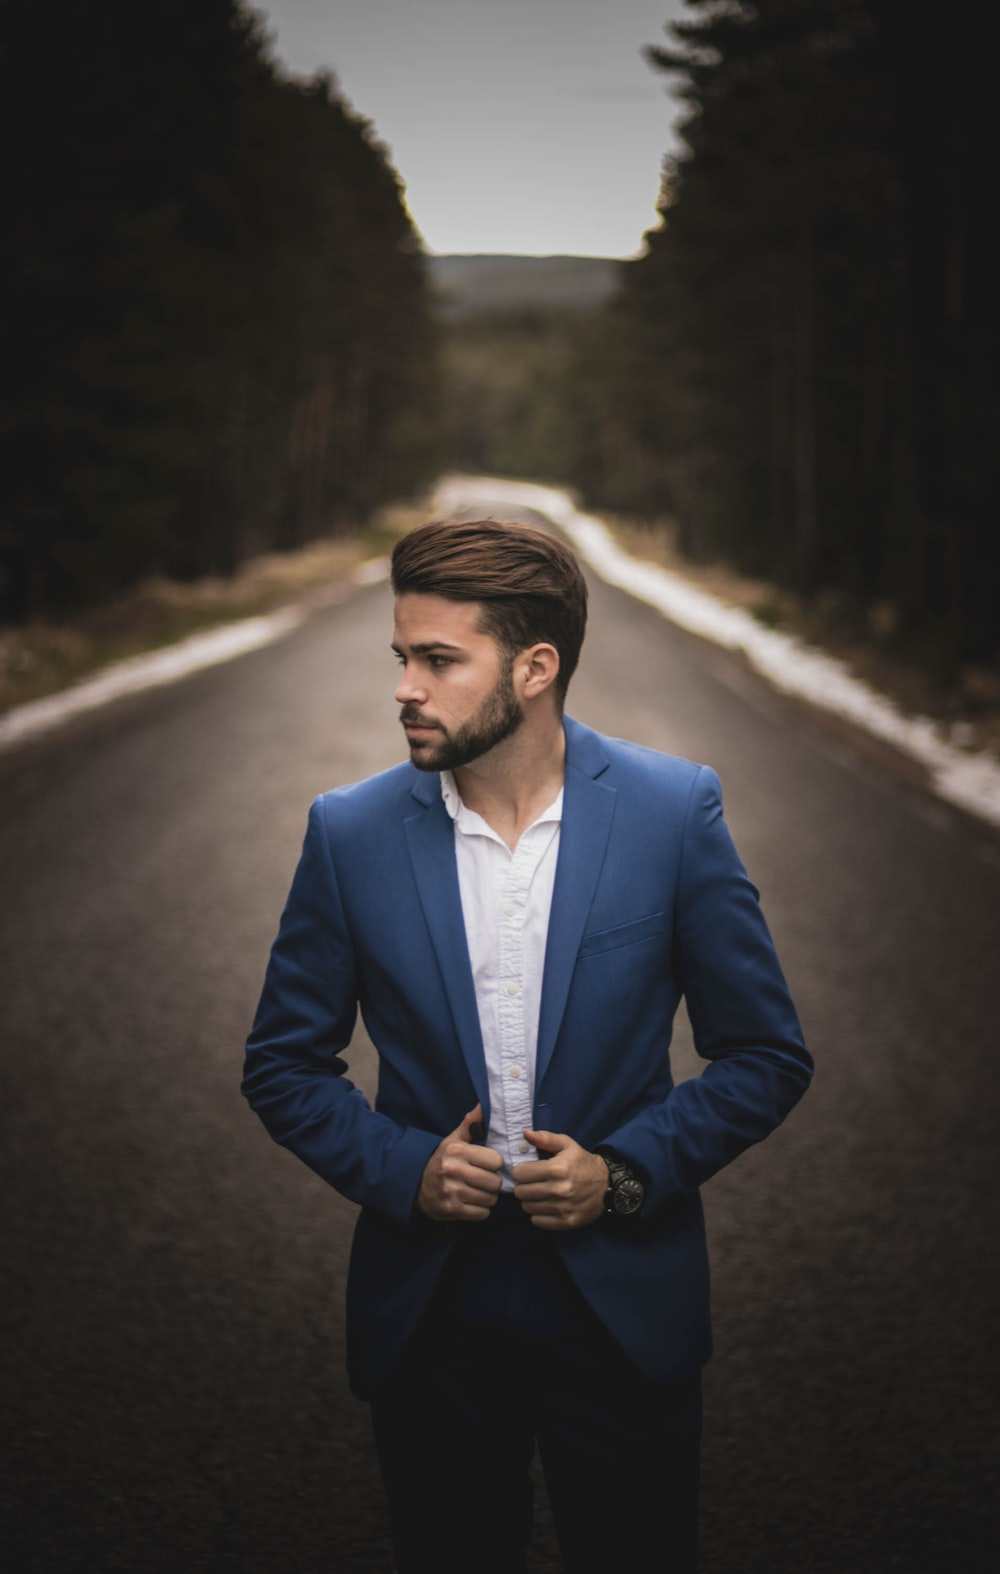 man on road wearing blue suit jacket